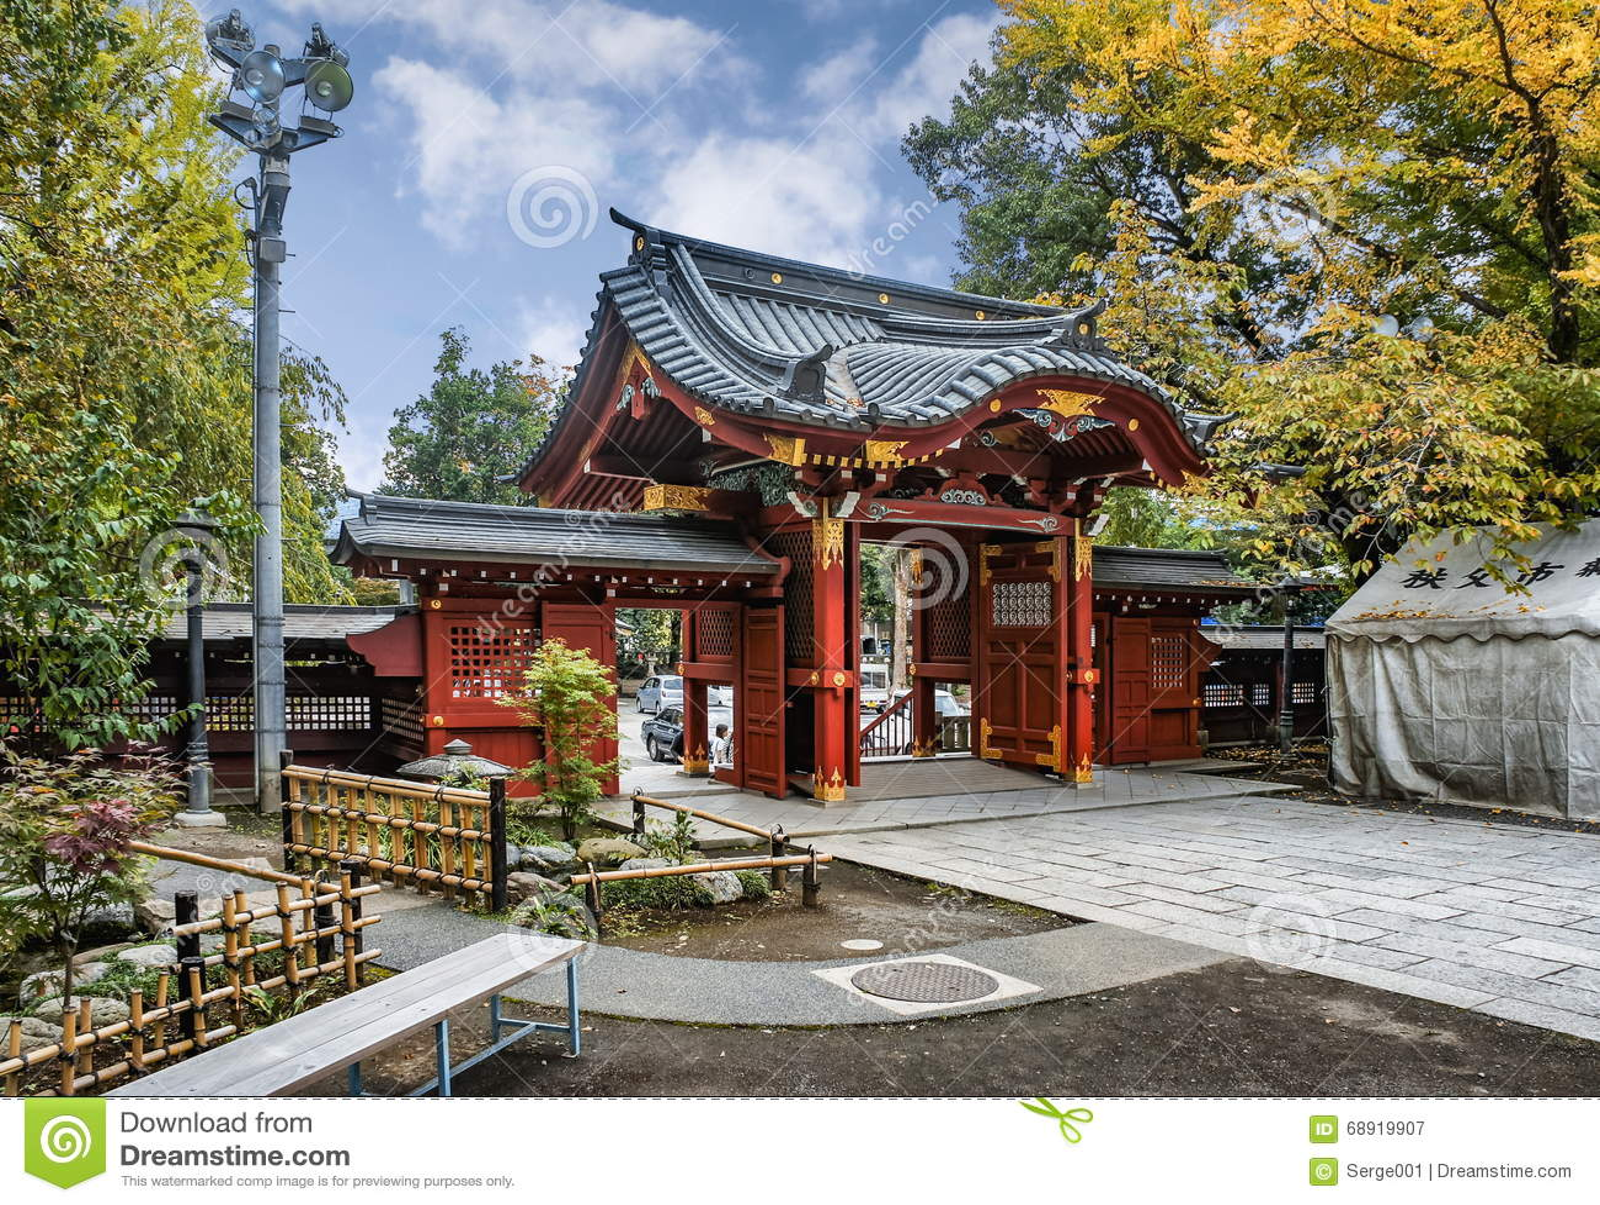 Entrance Gate To Chichibu Shrine, Chichibu, Saitama Prefecture, Japan. Editorial Photography ...